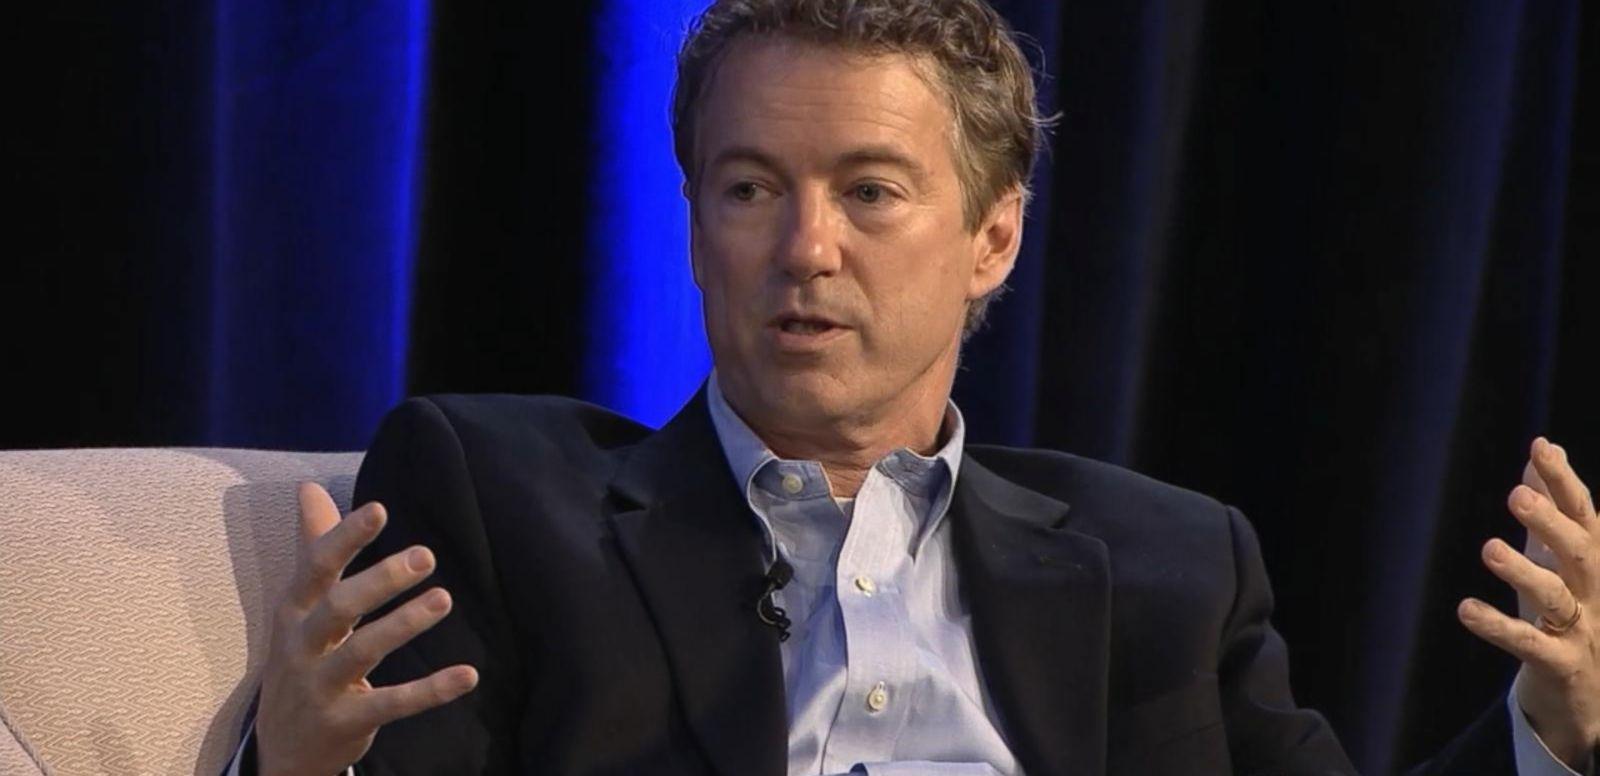 VIDEO: Rand Paul on Possible Romney Run